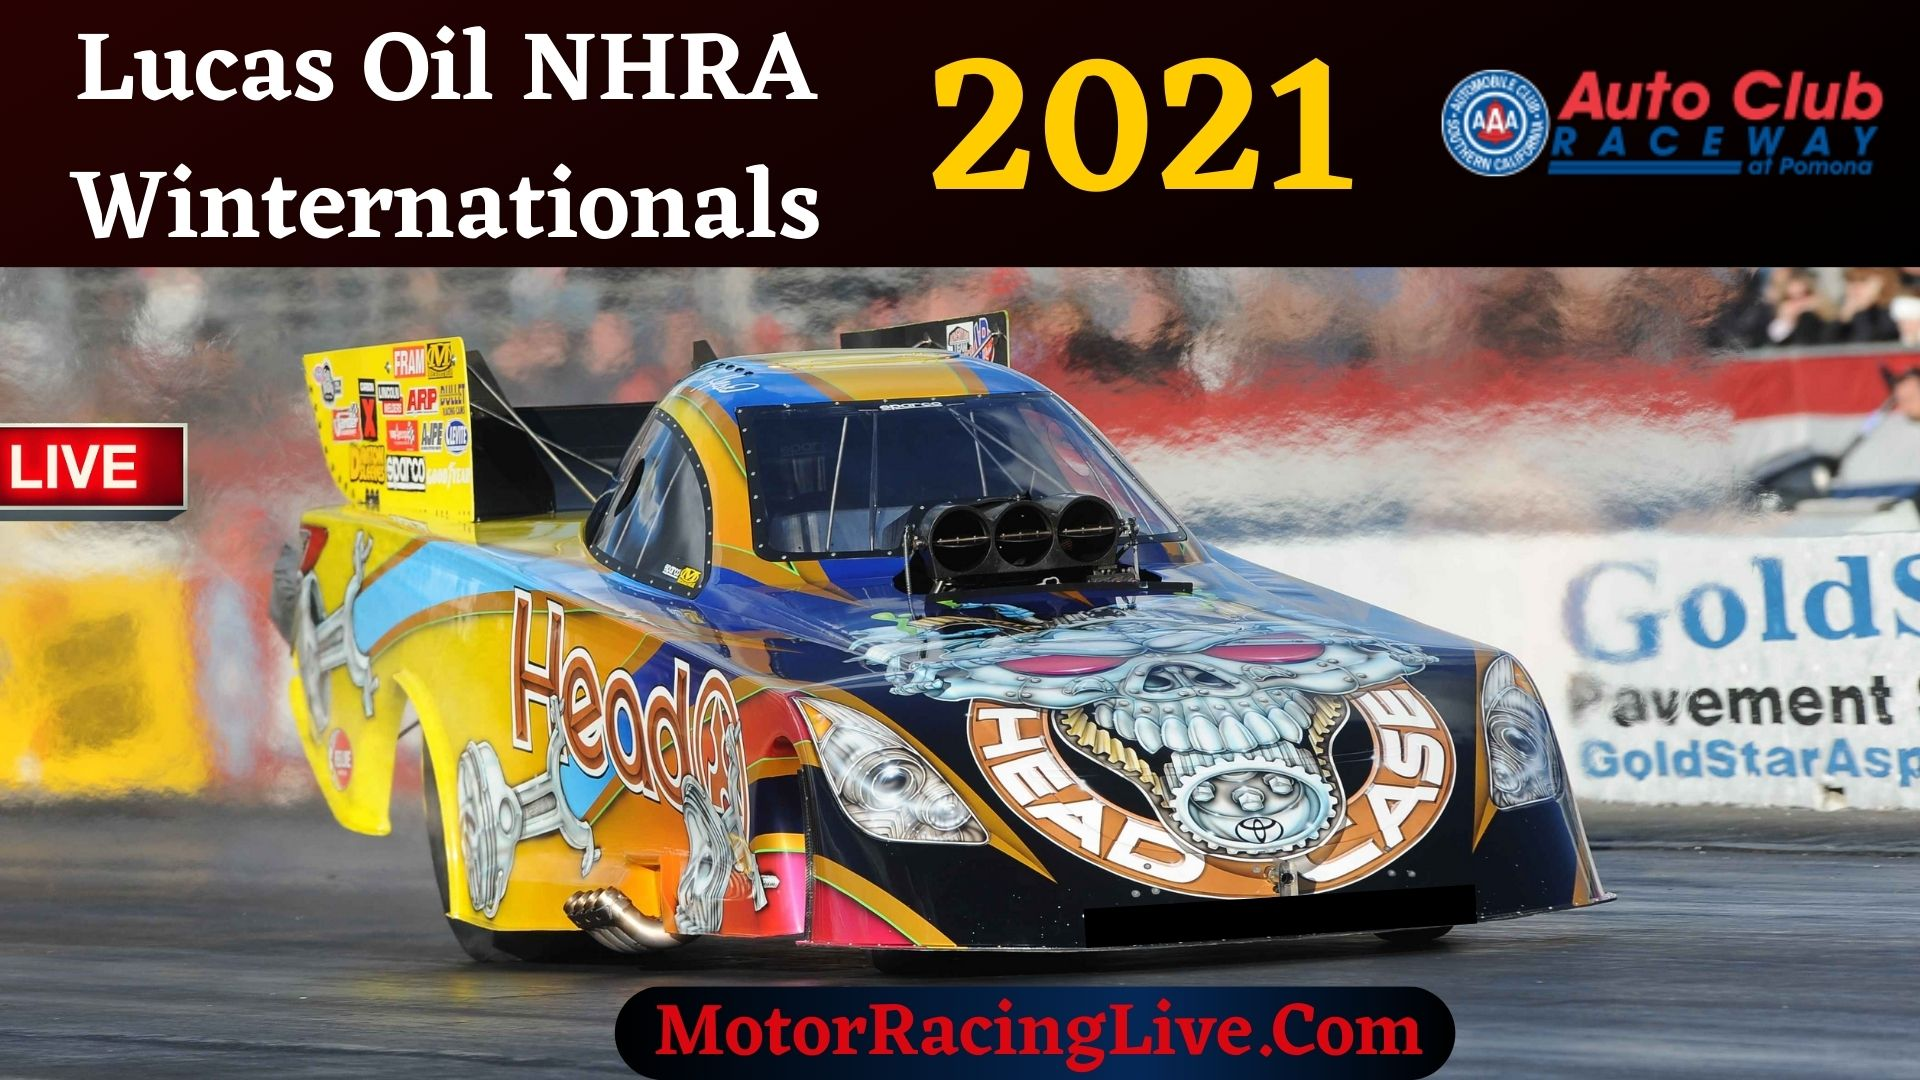 Lucas Oil NHRA Winternationals 2021 Live Stream